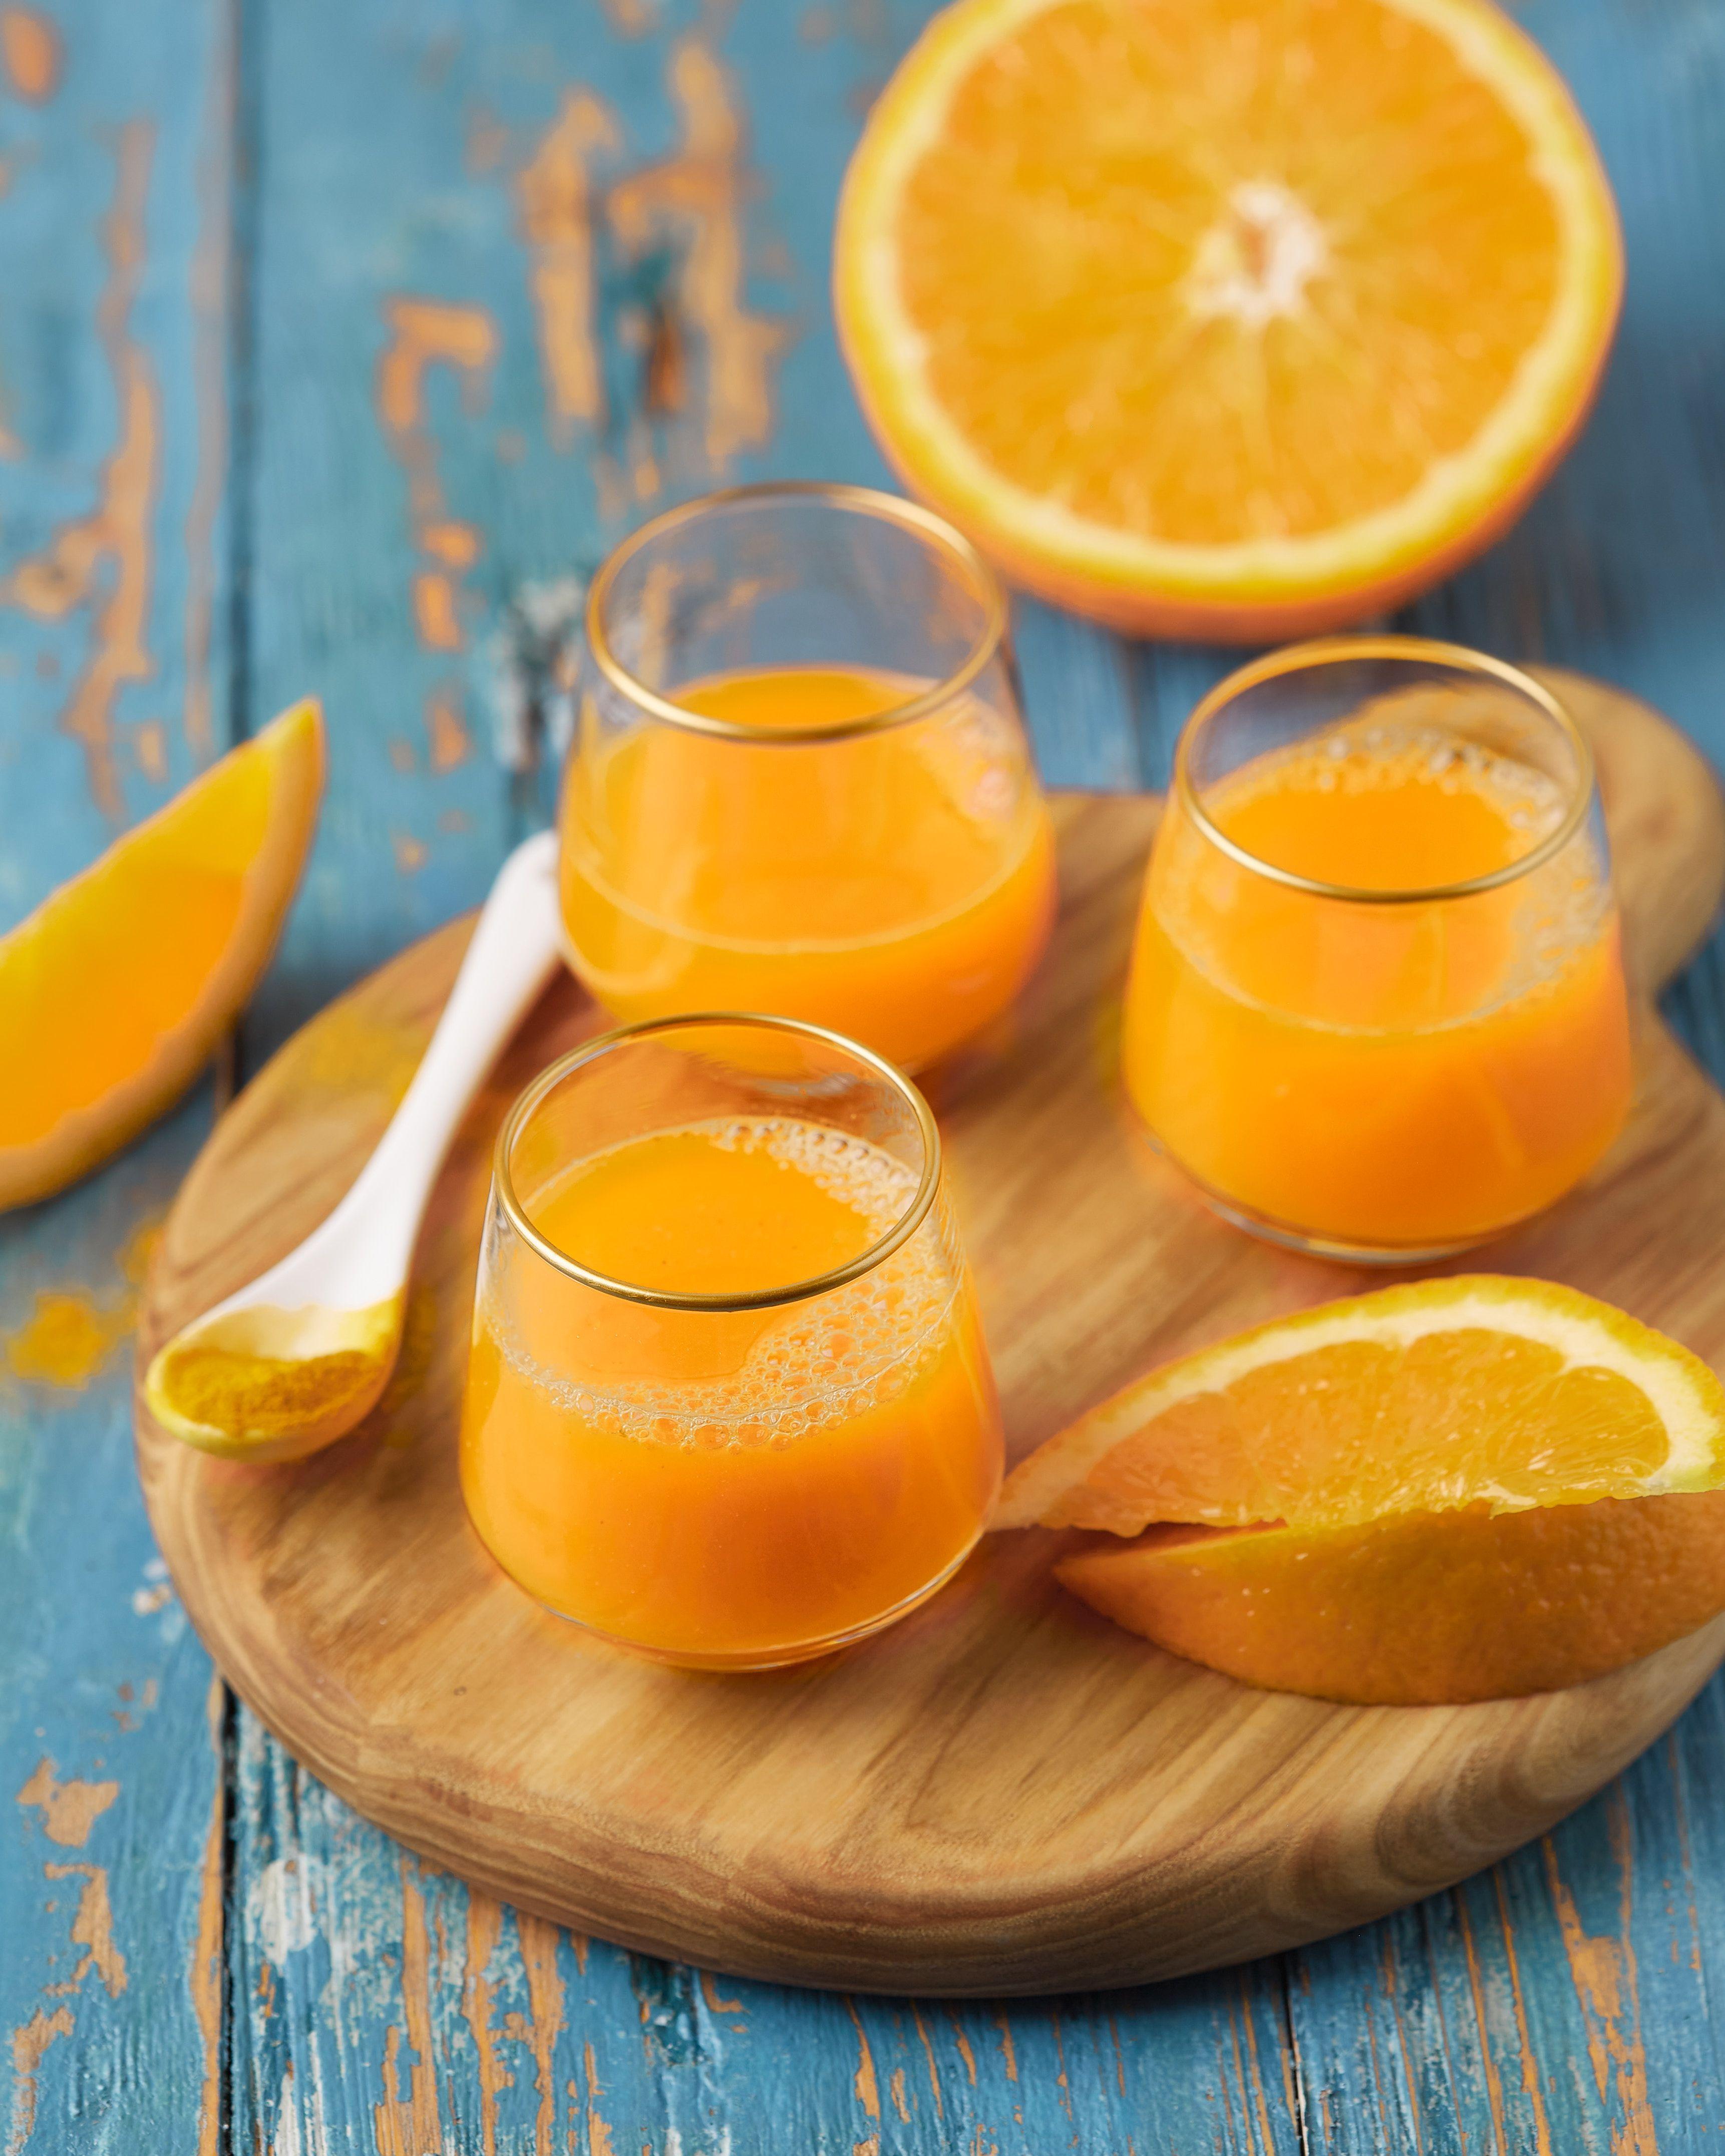 Carrot And Turmeric Juice عصير الجزر والكركم Turmeric Juice Turmeric Juice